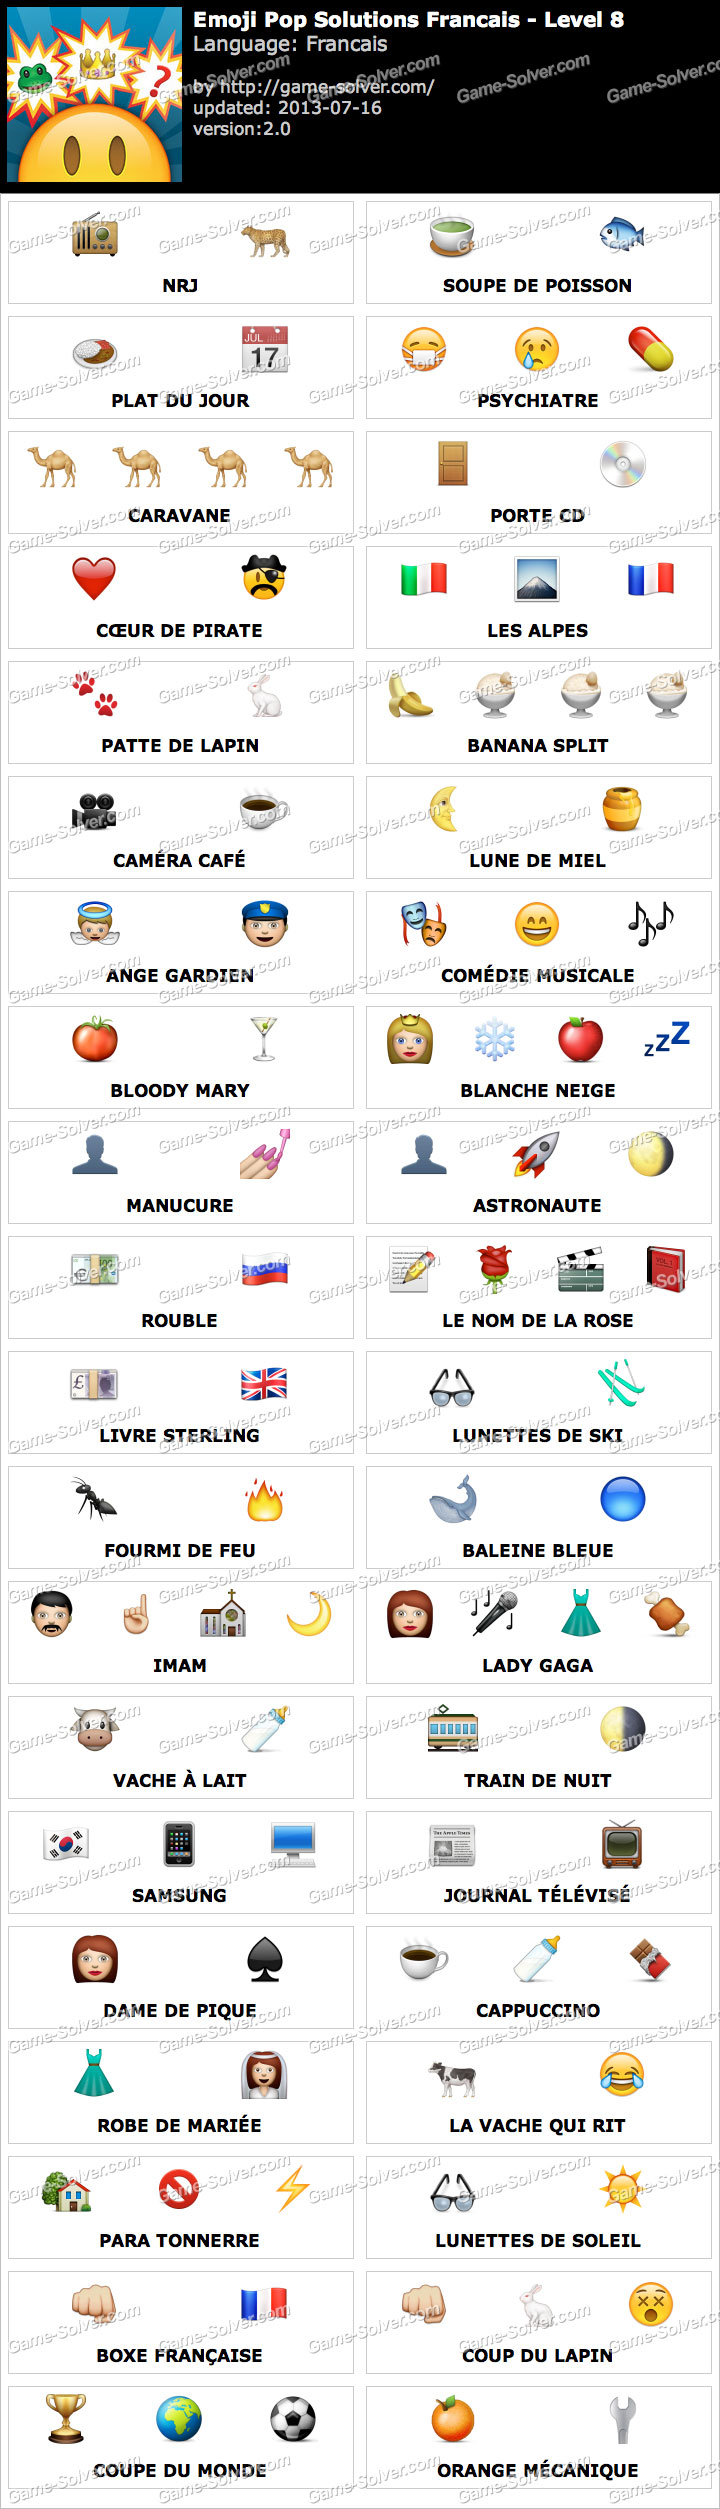 Fabuleux Emoji Pop Niveau 8 - Game Solver JB24